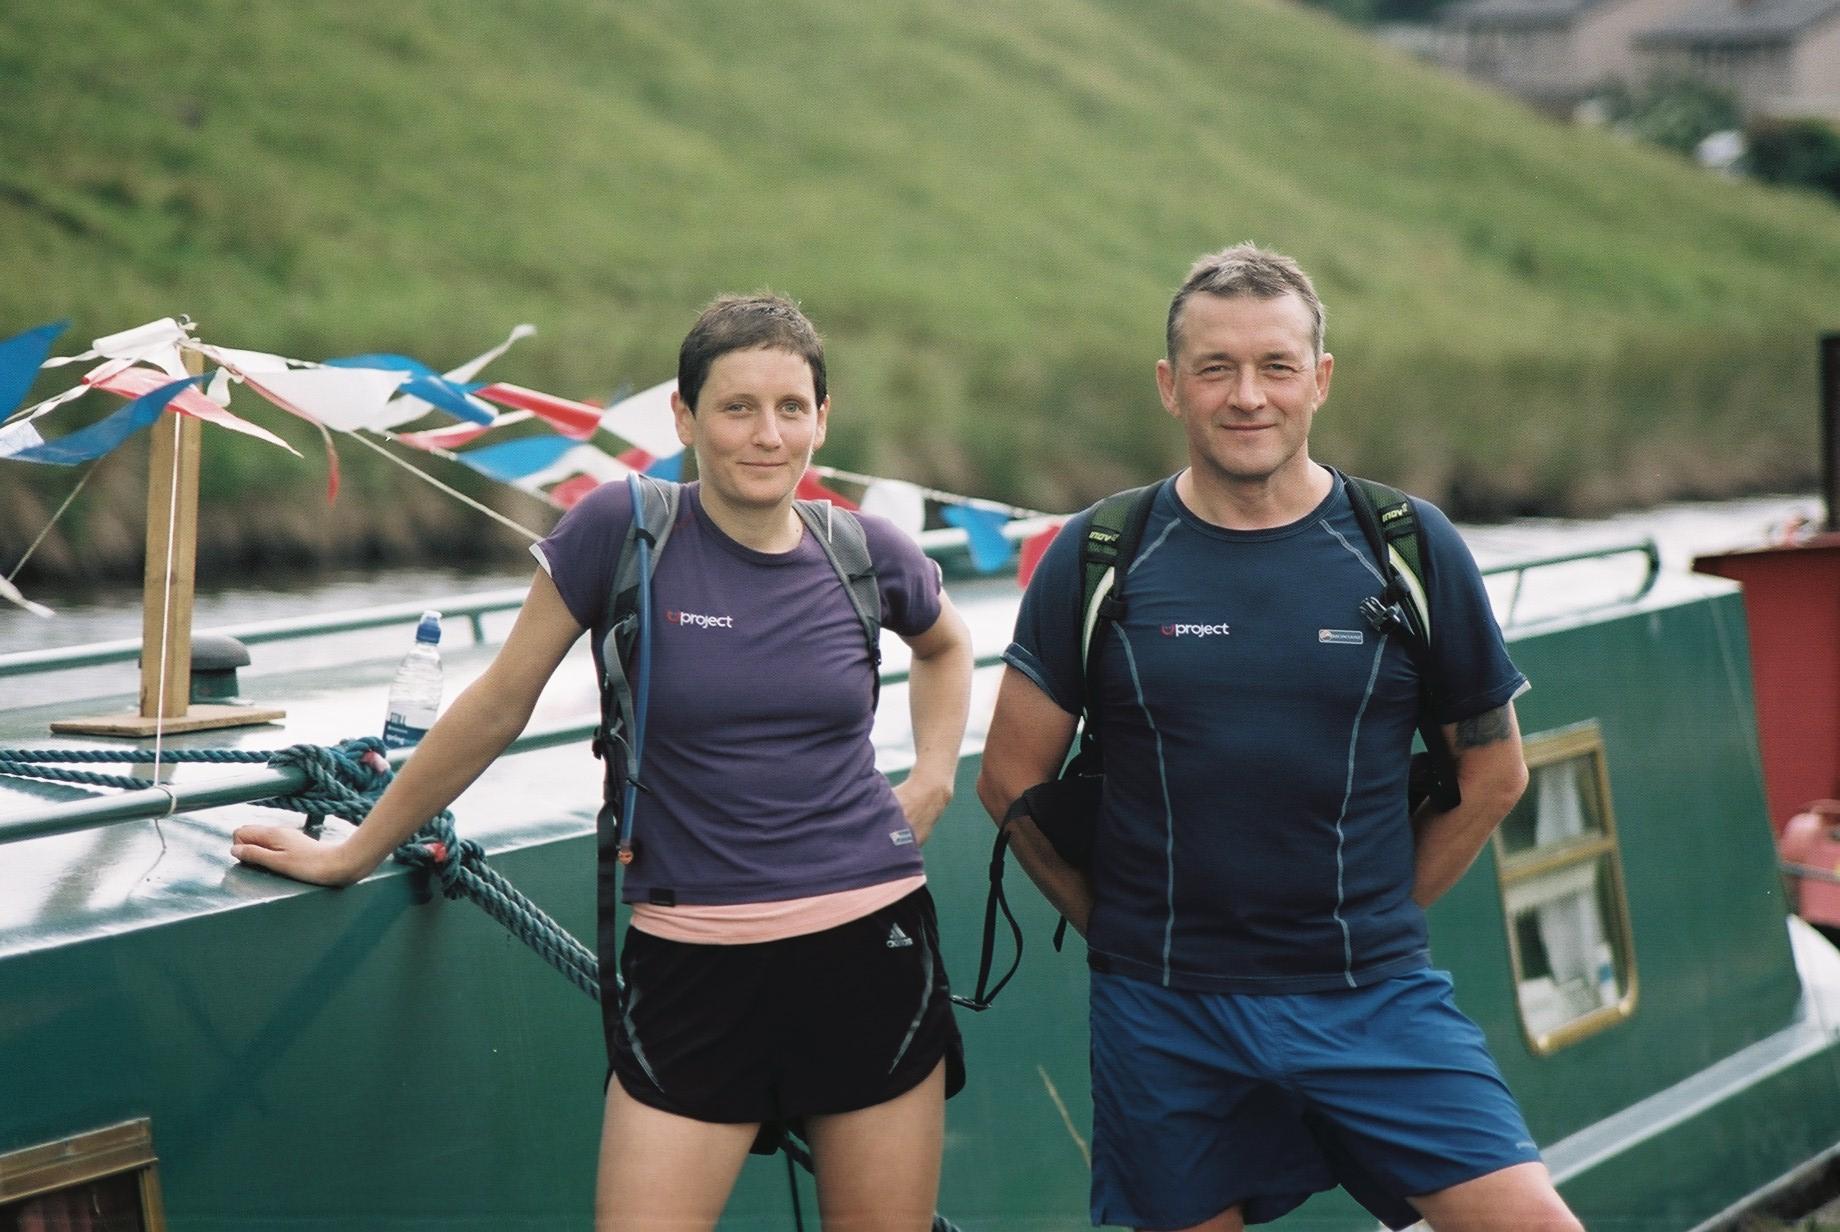 Alan and Gaynor Keane